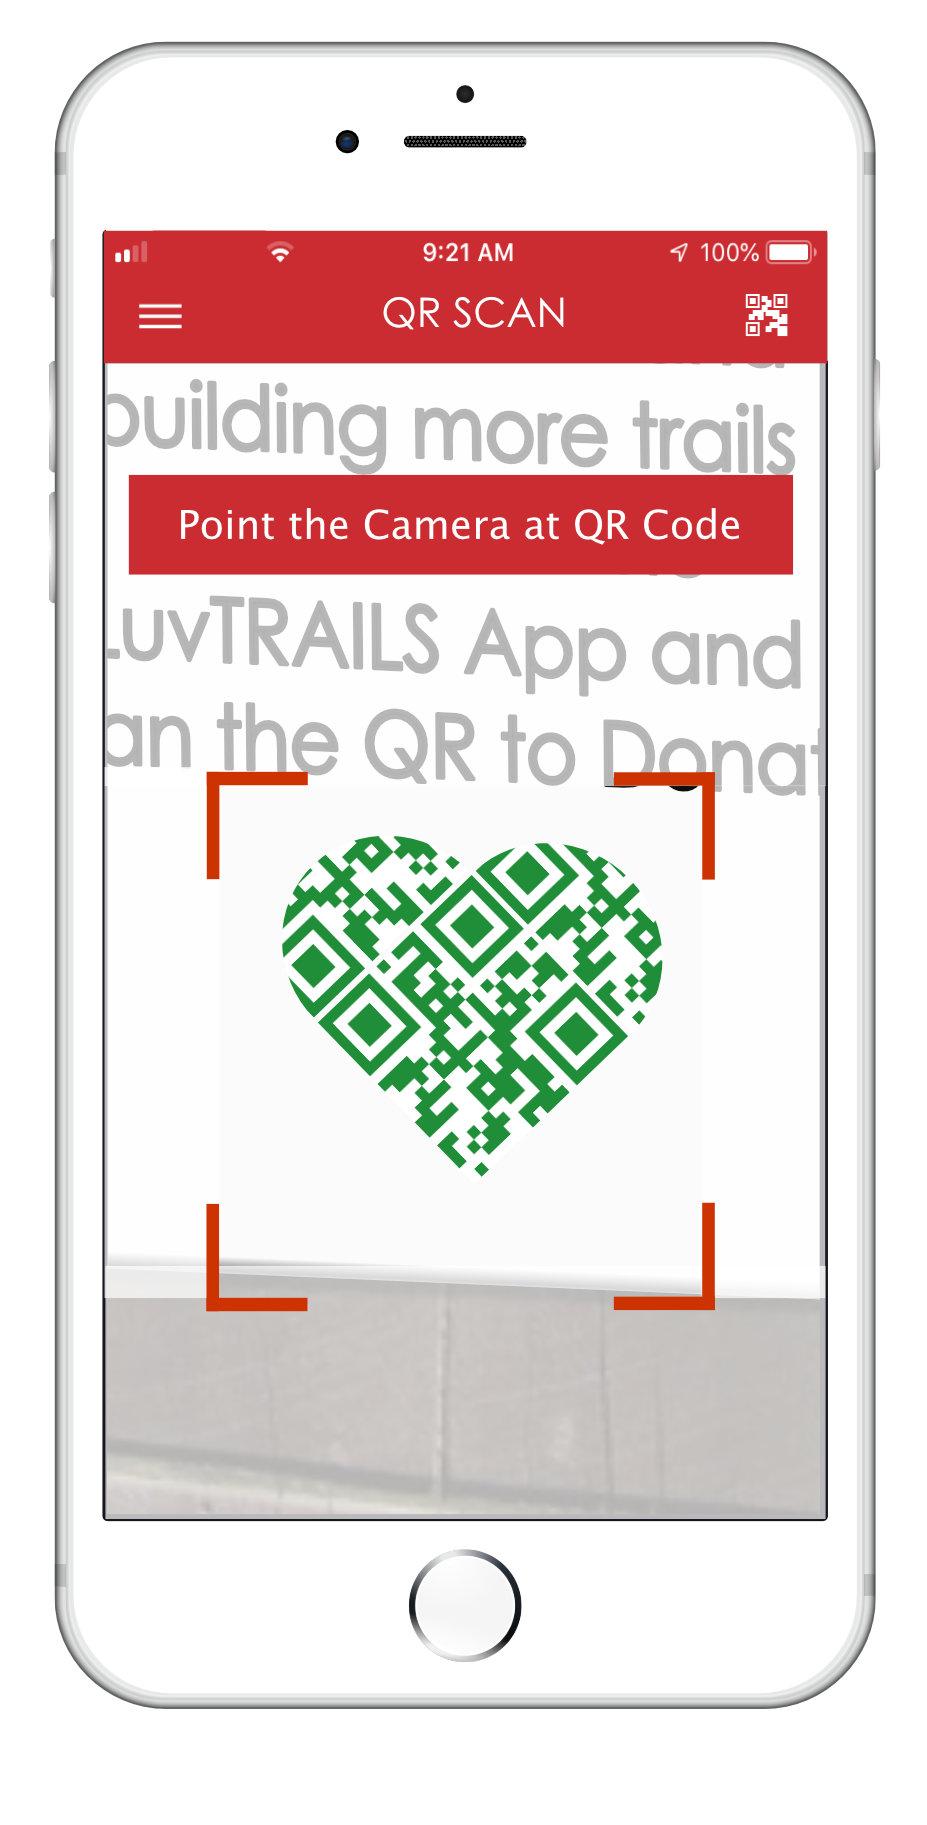 Luvtrails QR code scan